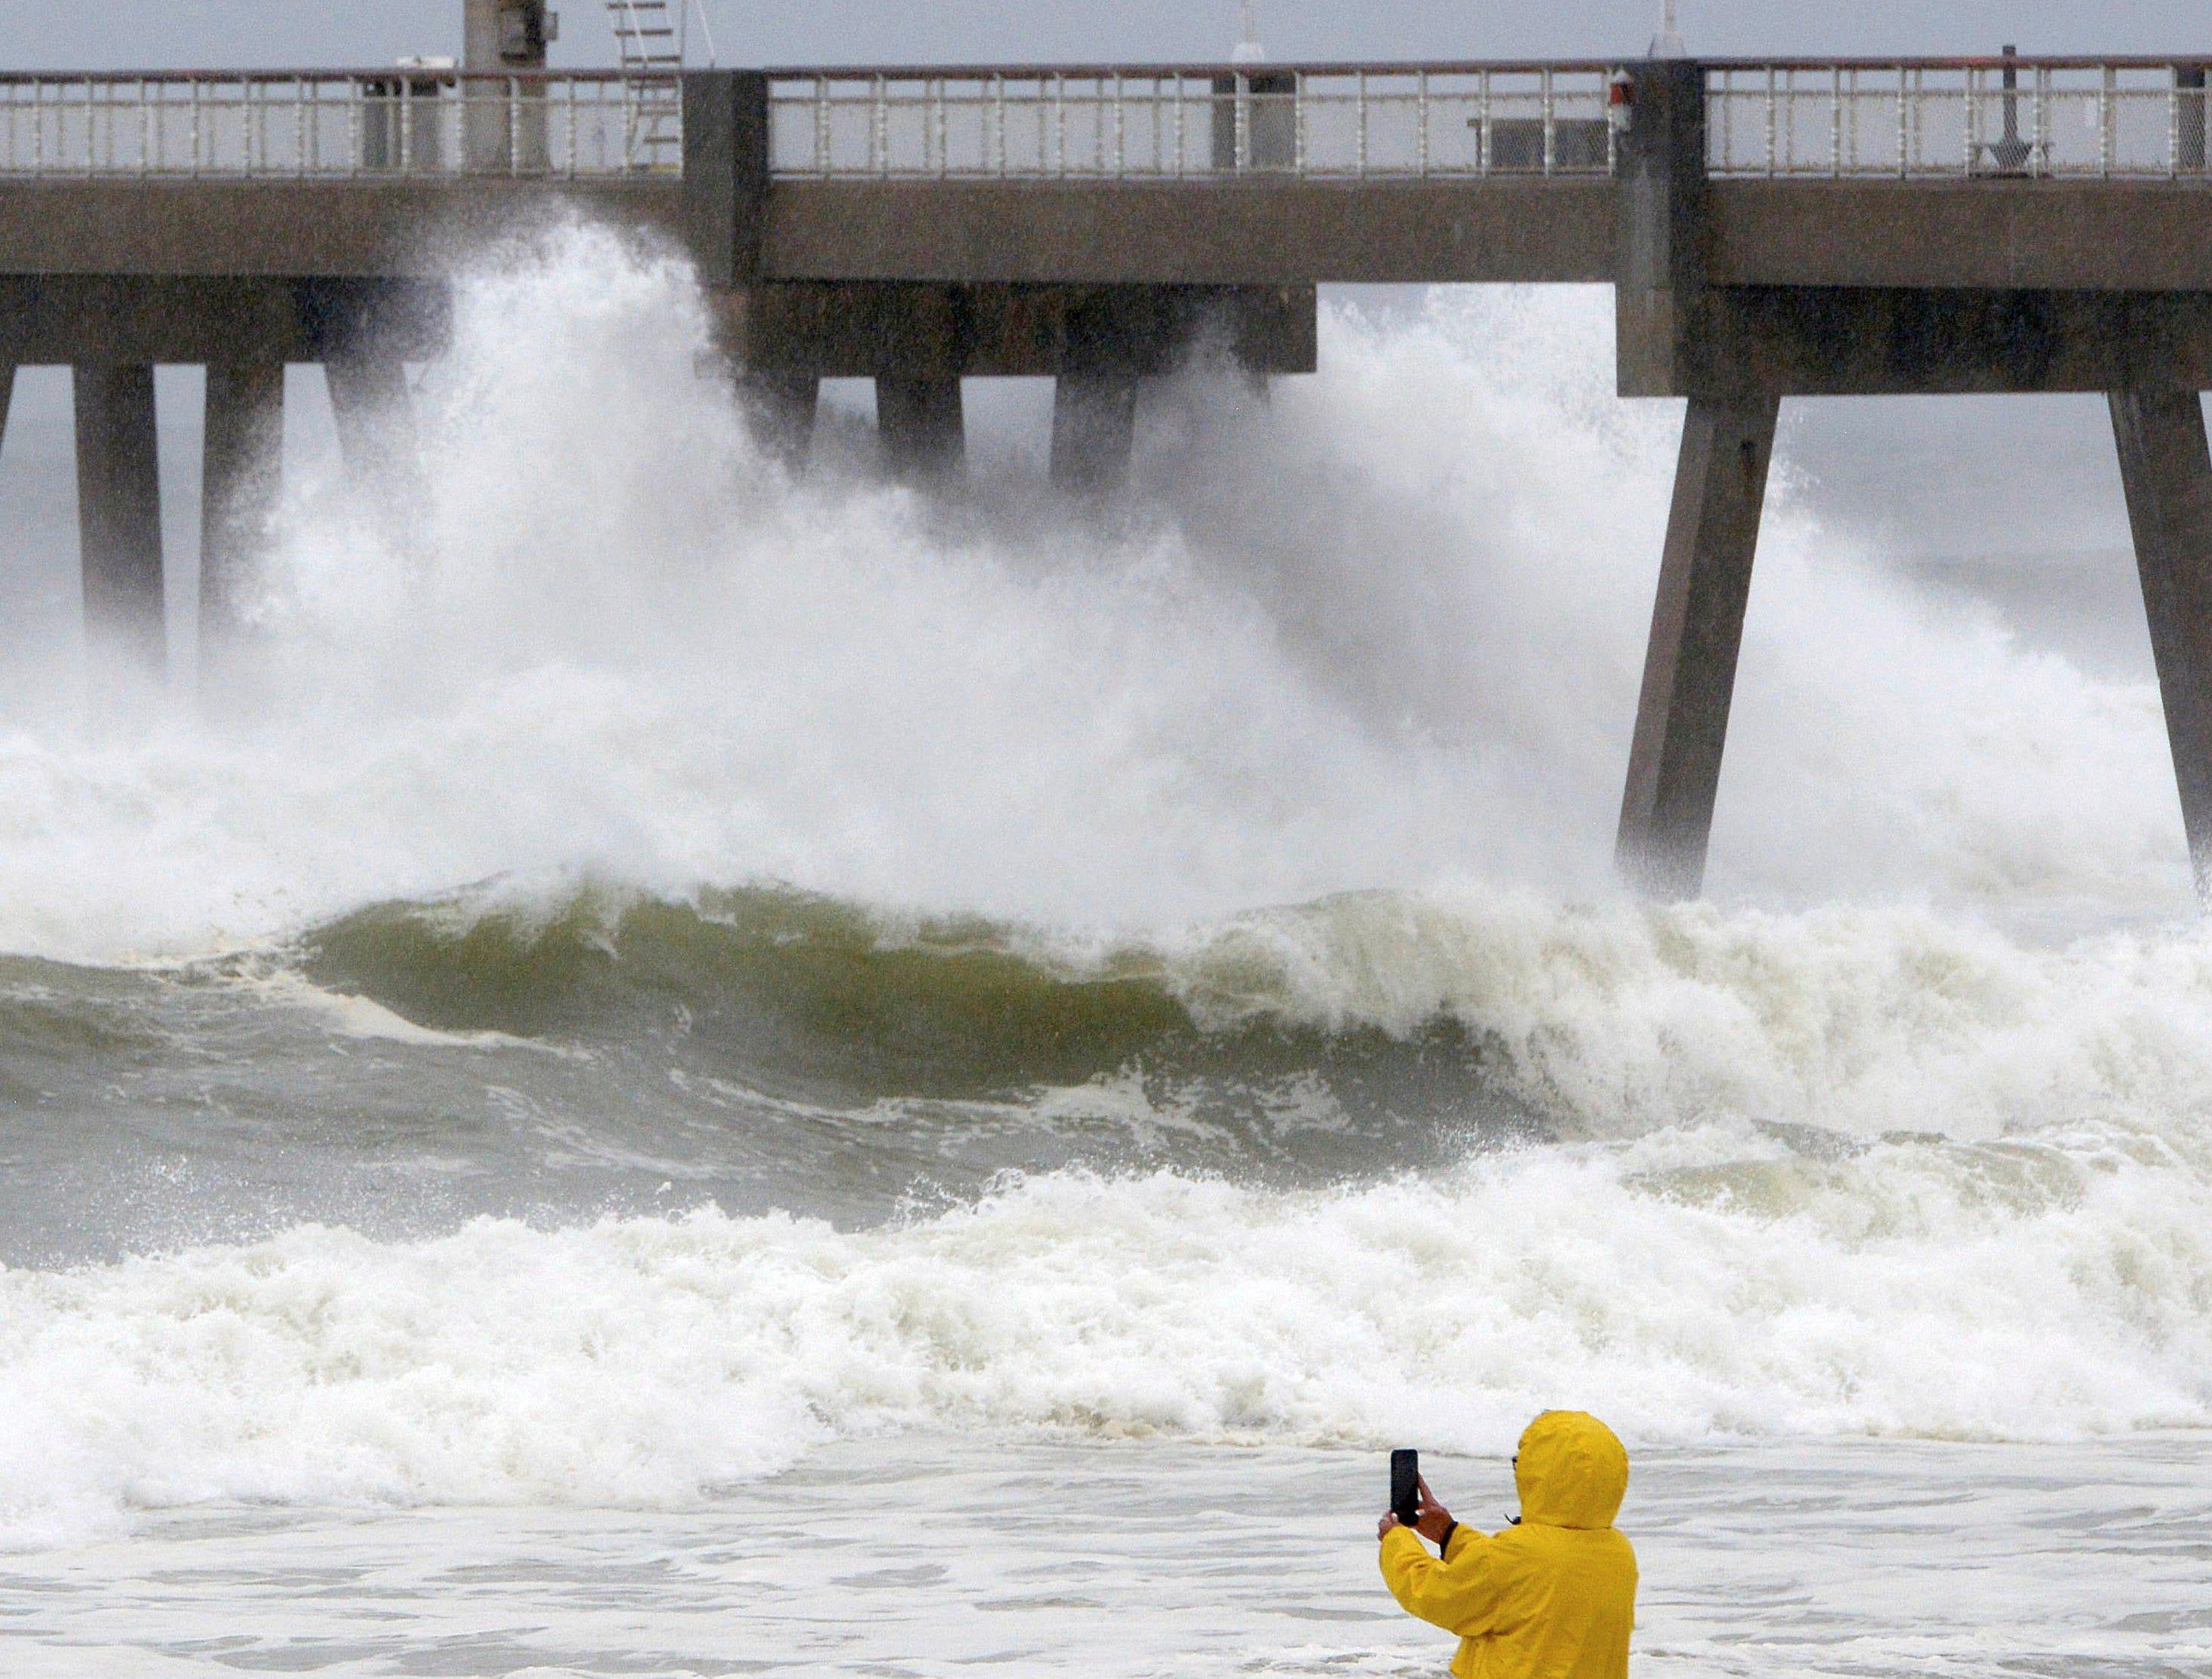 A beachgoer take photos of the waves on Oct. 10, 2018, on Okaloosa Island in Fort Walton Beach, Fla., behind the boardwalk as Hurricane Michael impacts the coast.